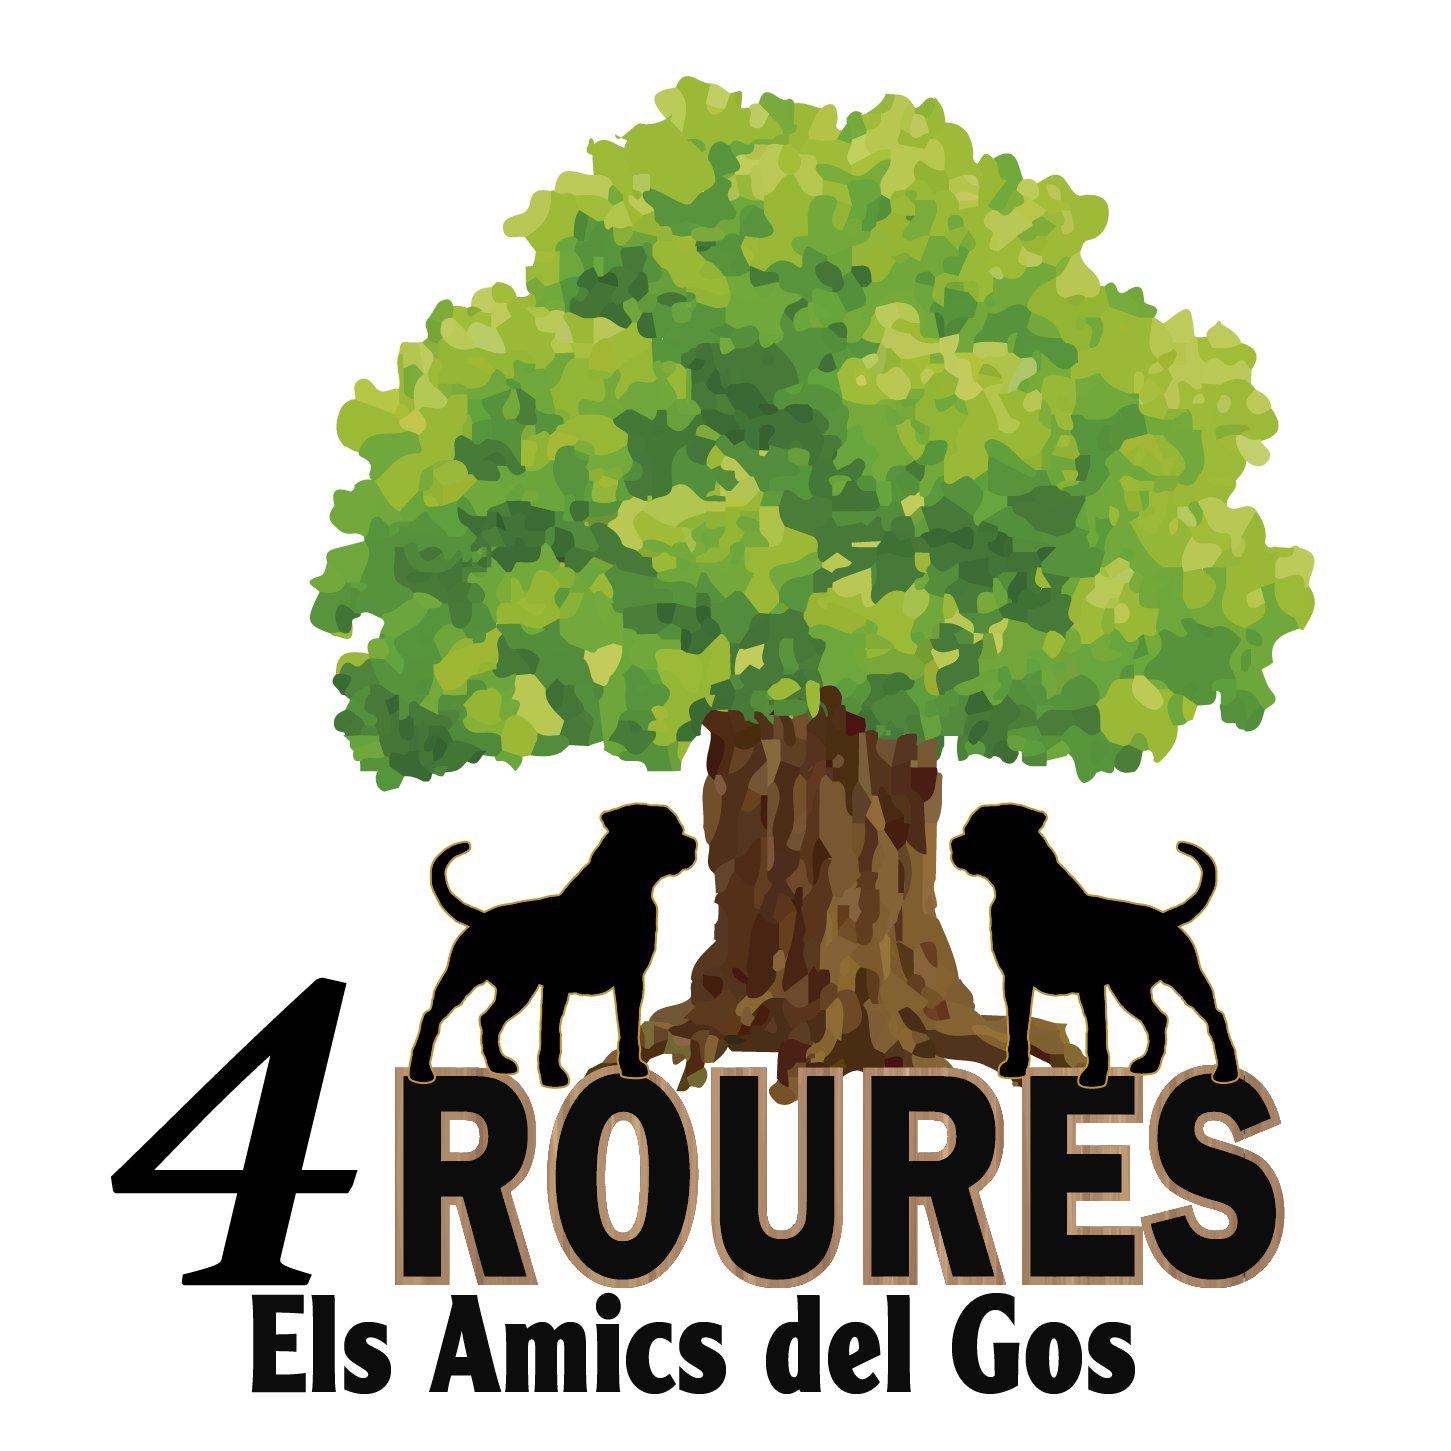 4 Roures